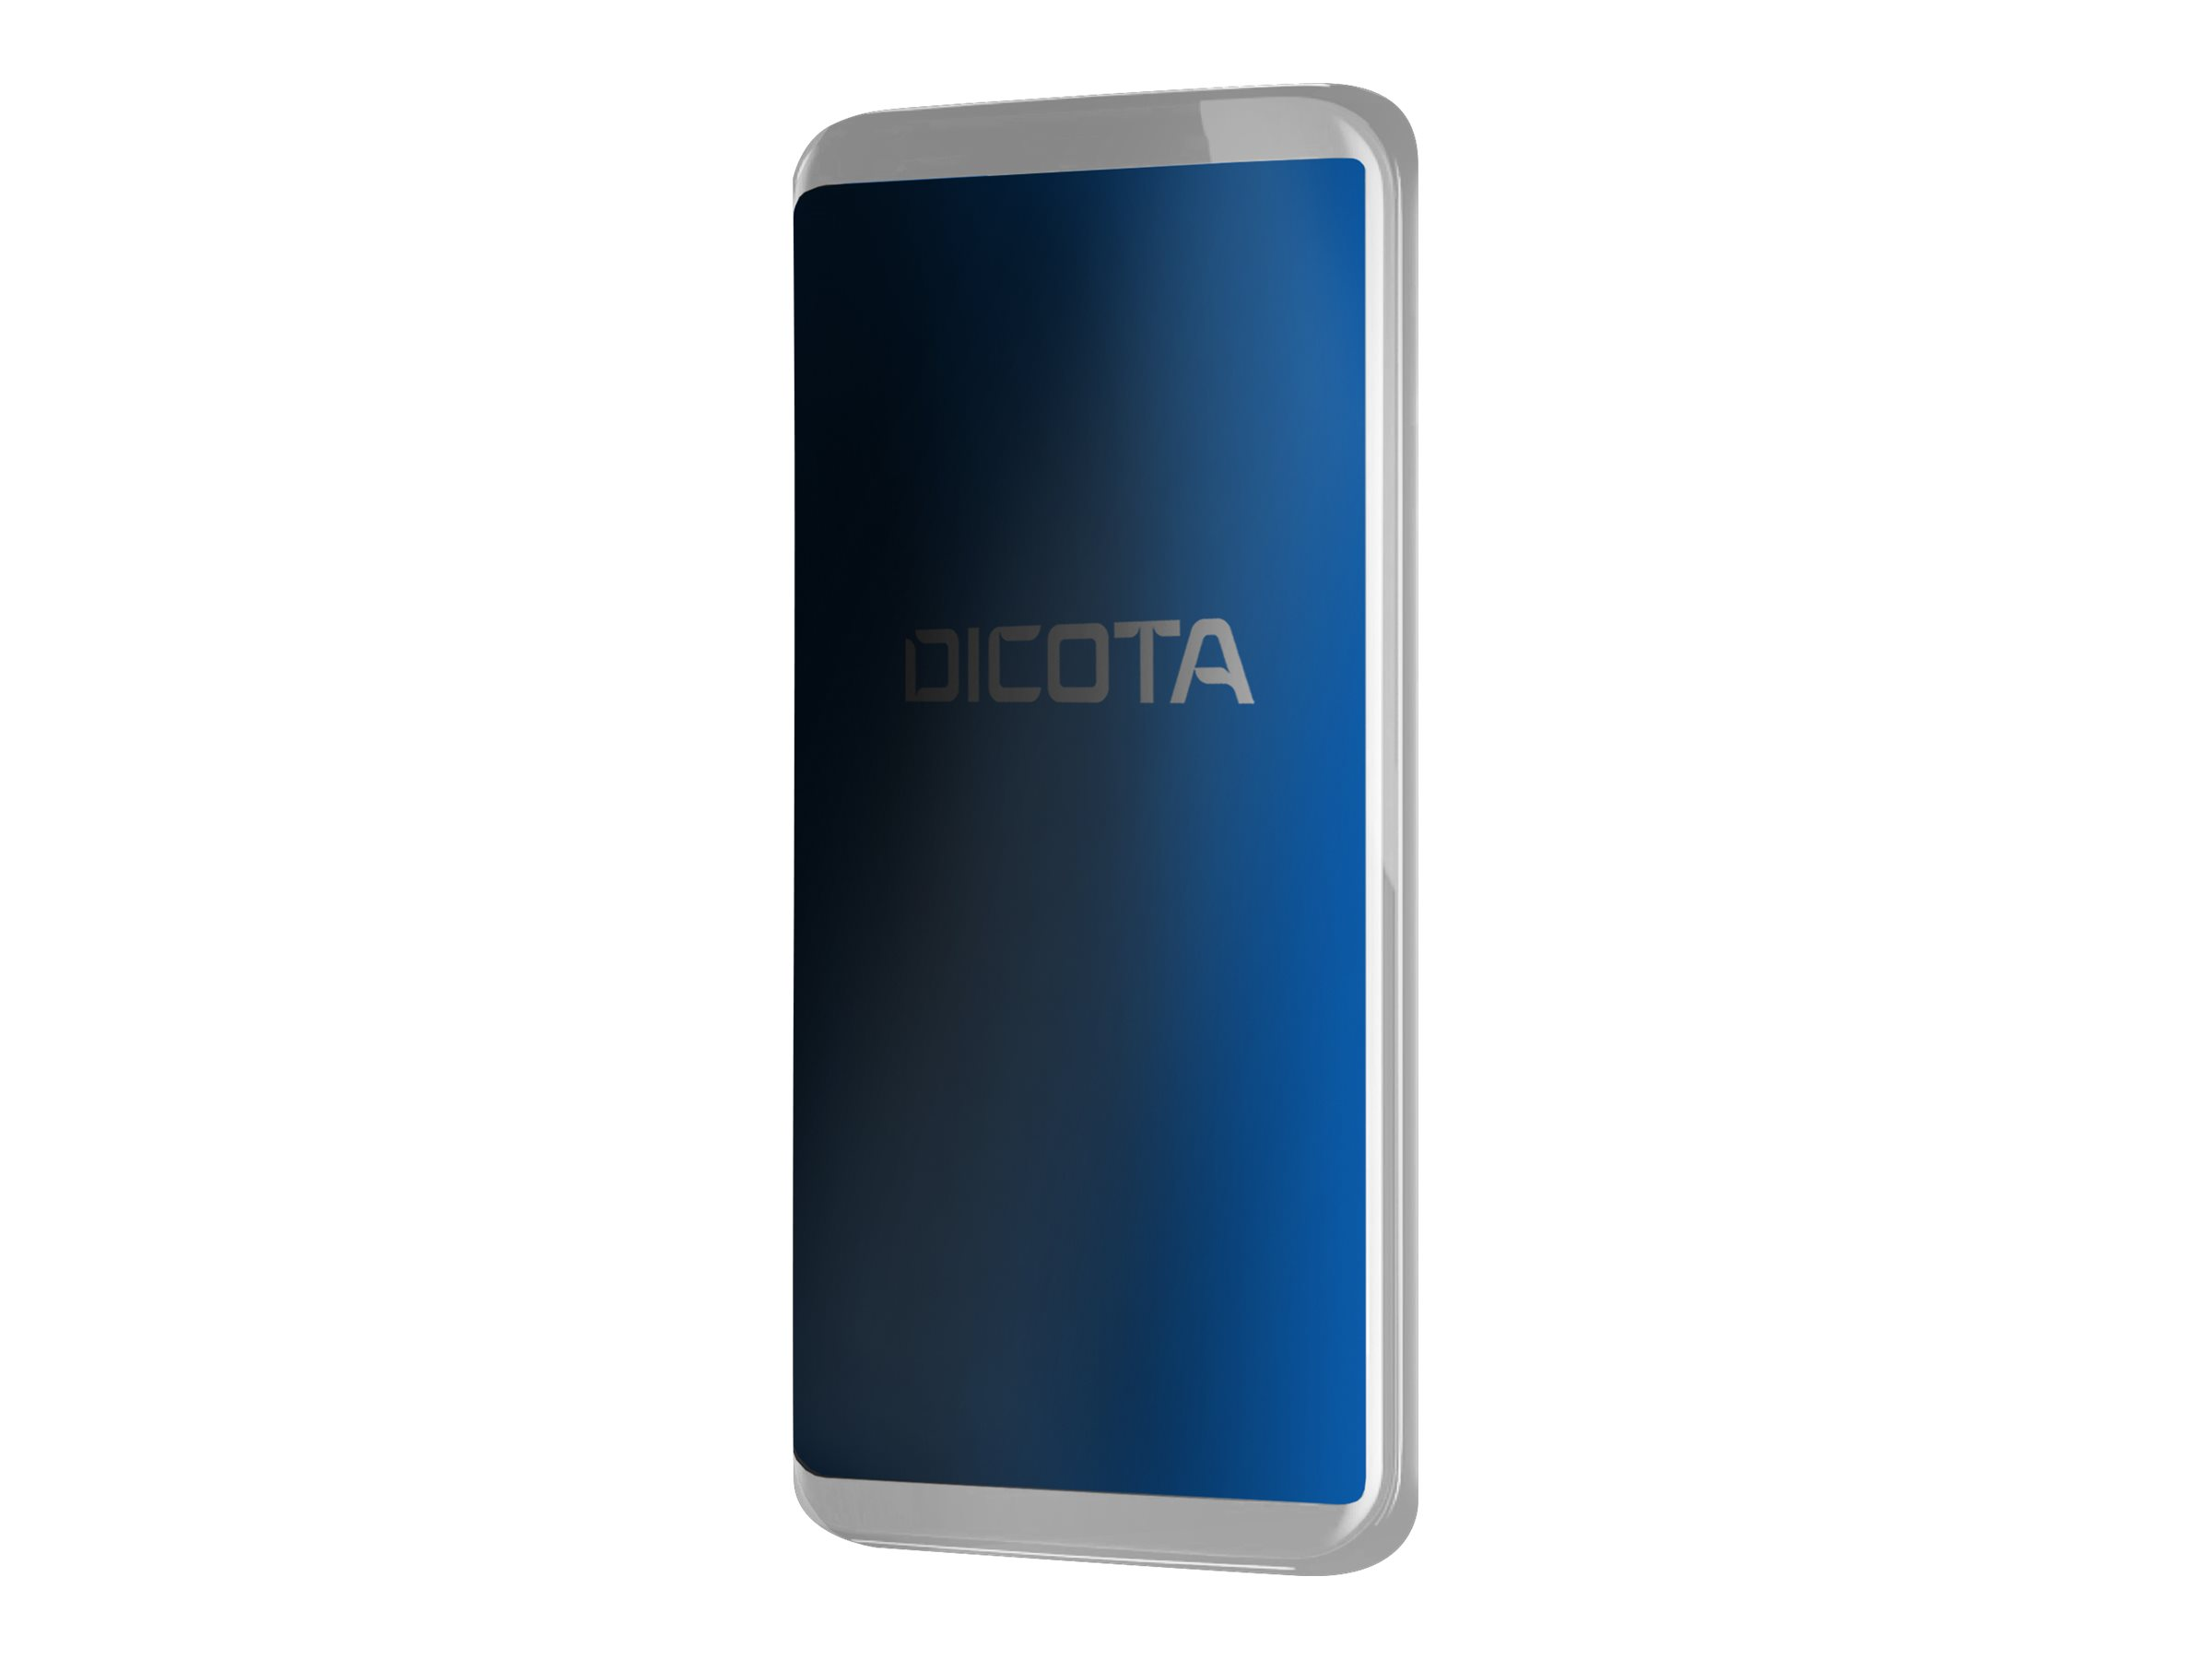 Dicota Privacy Filter - Blickschutzfilter - 4-Wege